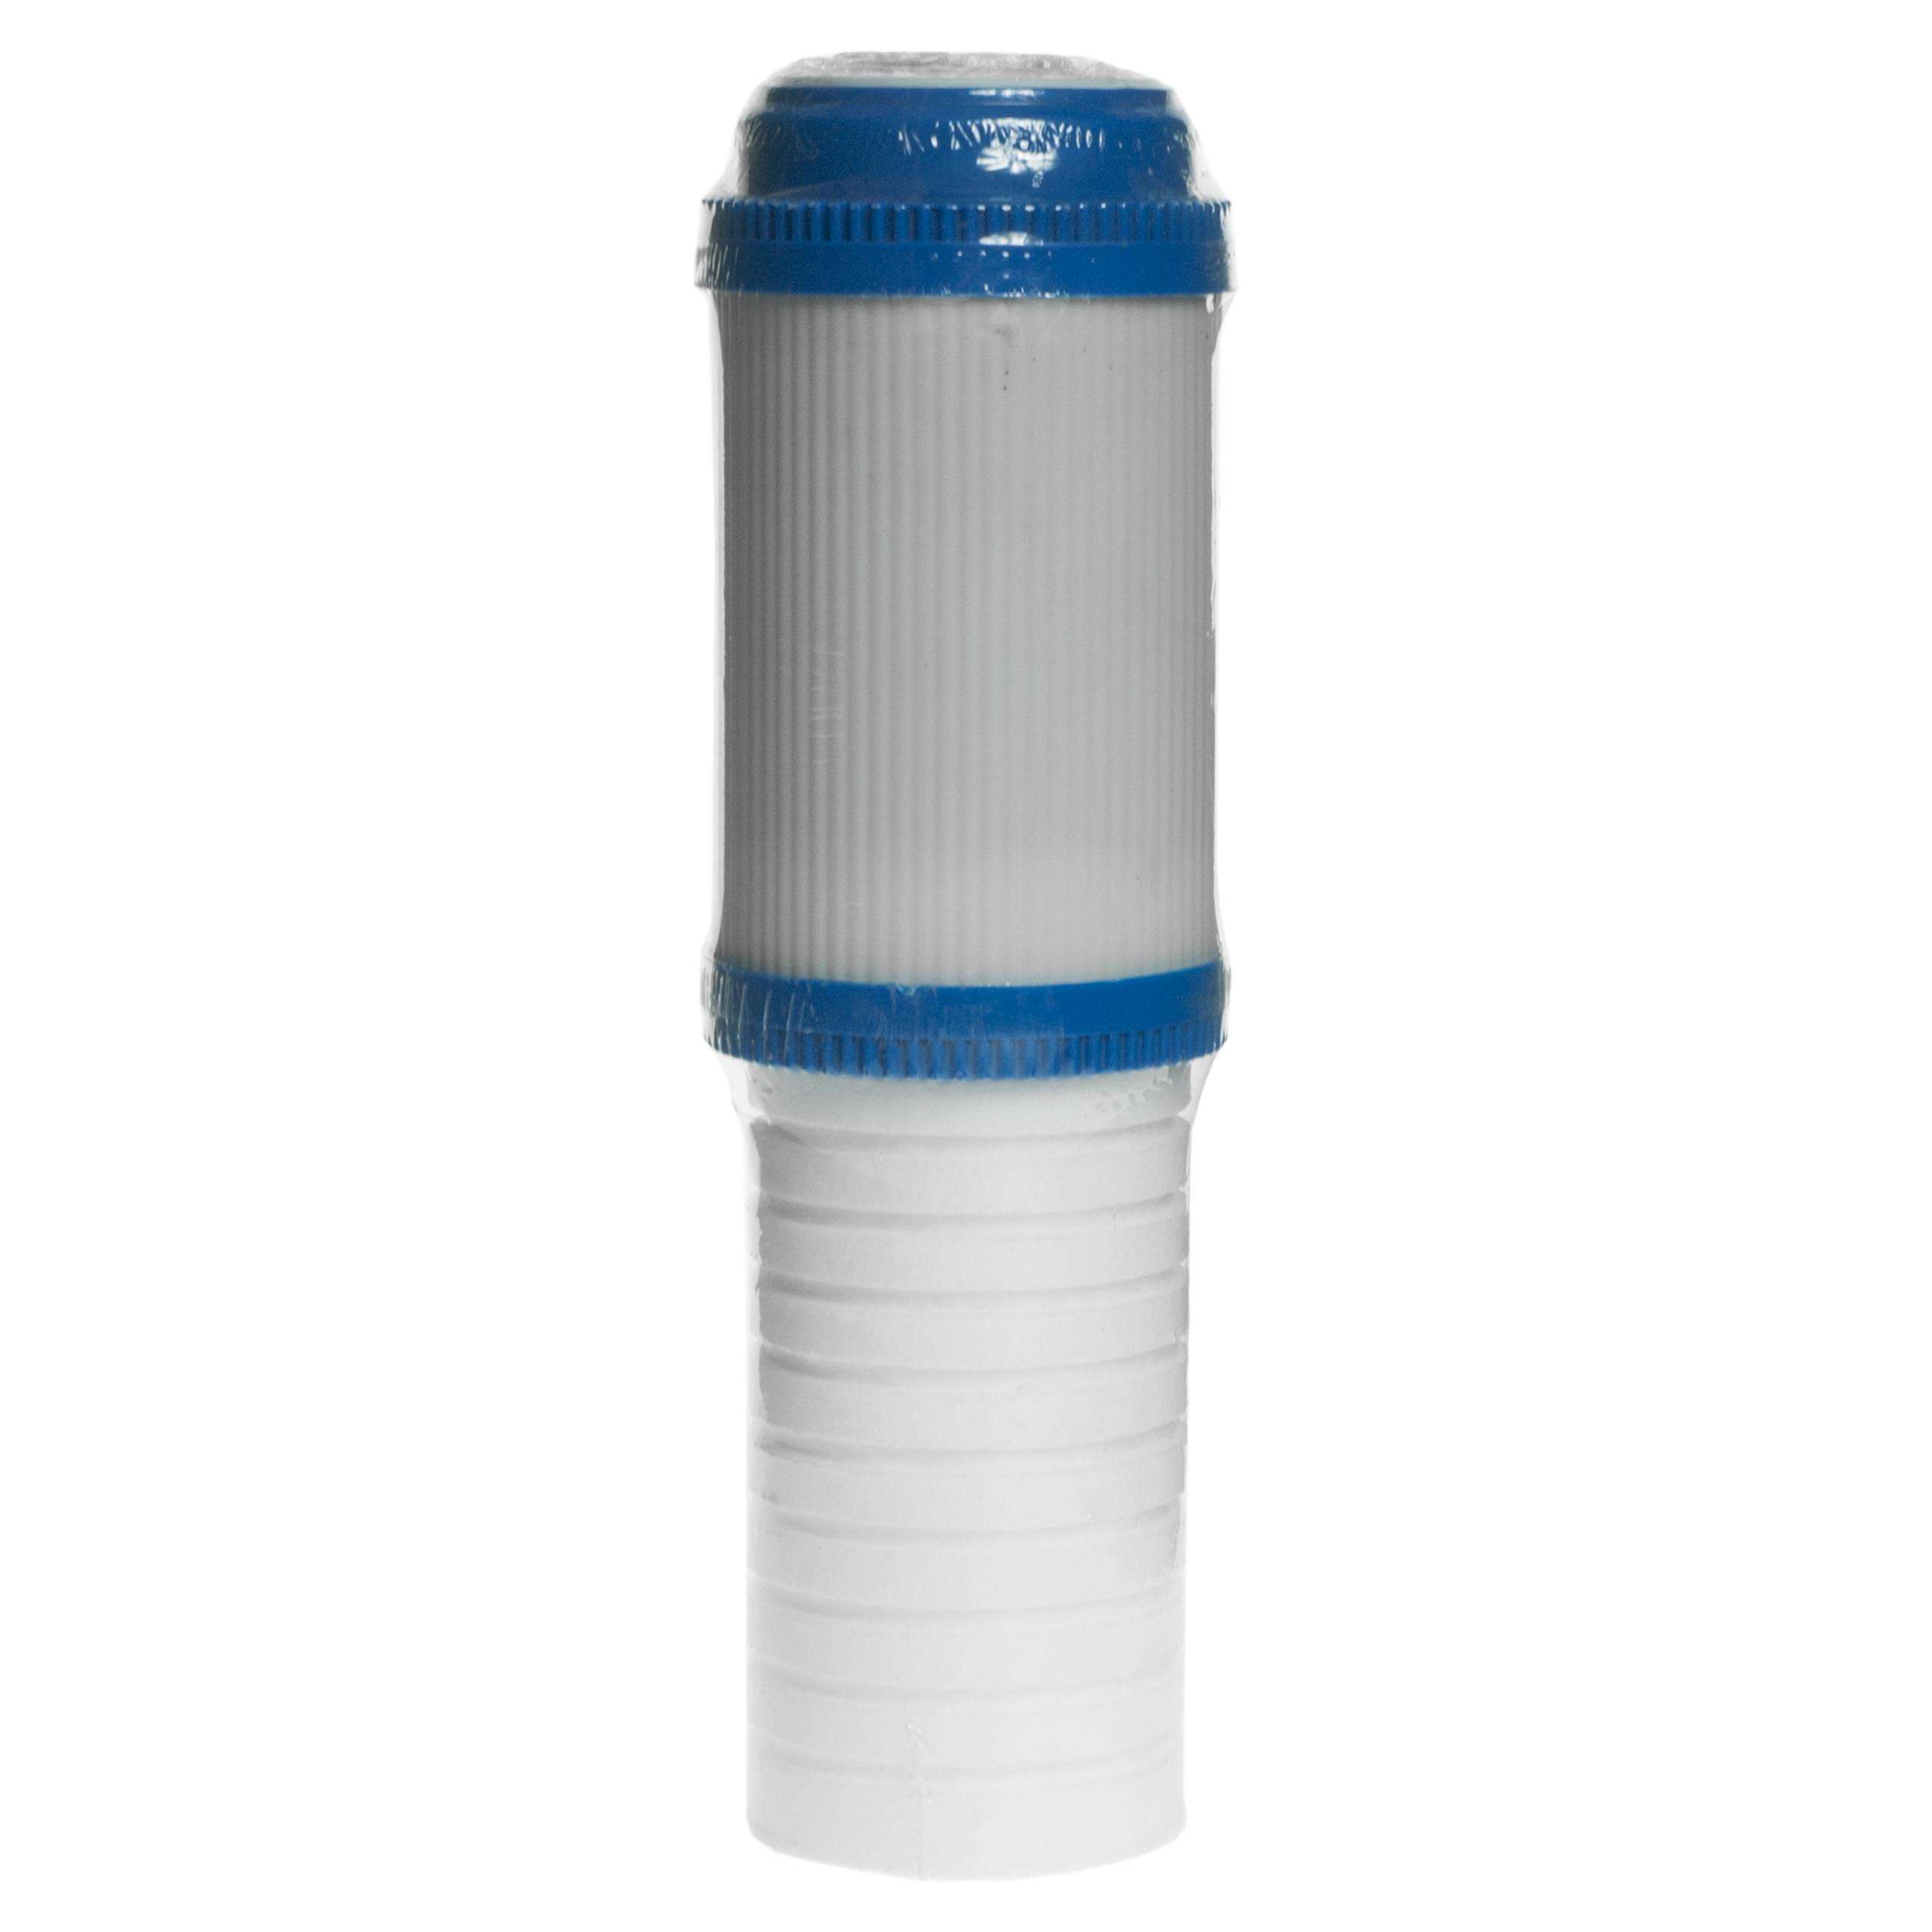 Filter Piangular Cartridge 10